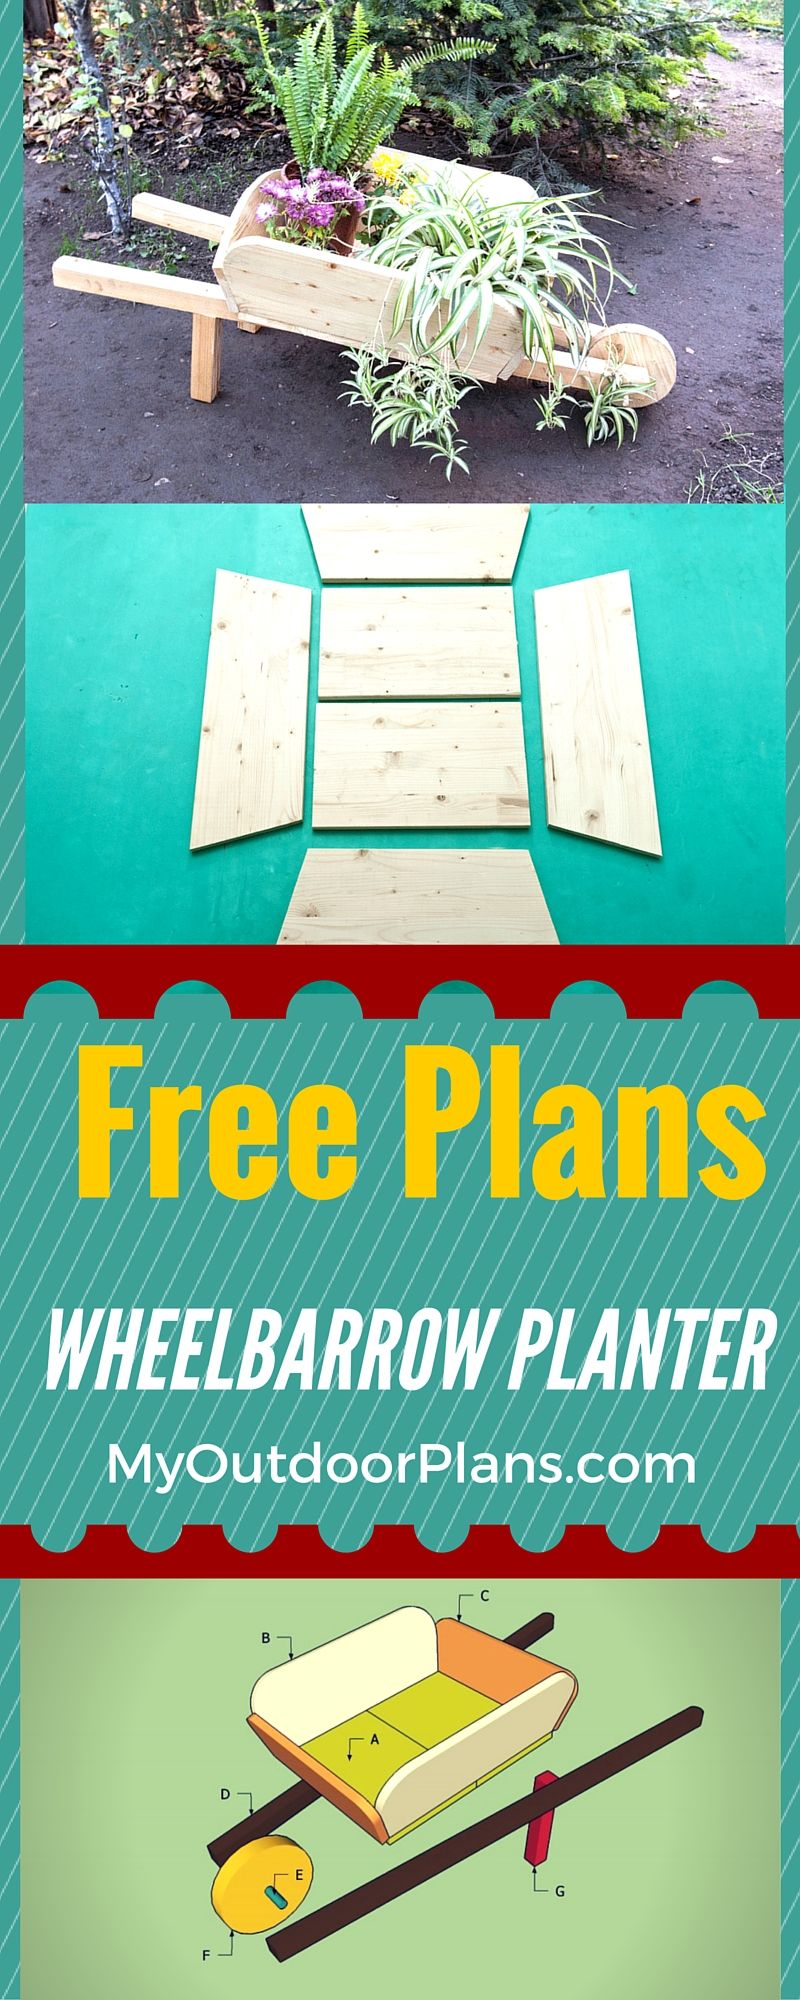 small resolution of how to build a wheelbarrow planter easy to follow plans for building a wood wheelbarrow planter for your garden in just a few hours howtospecialist com